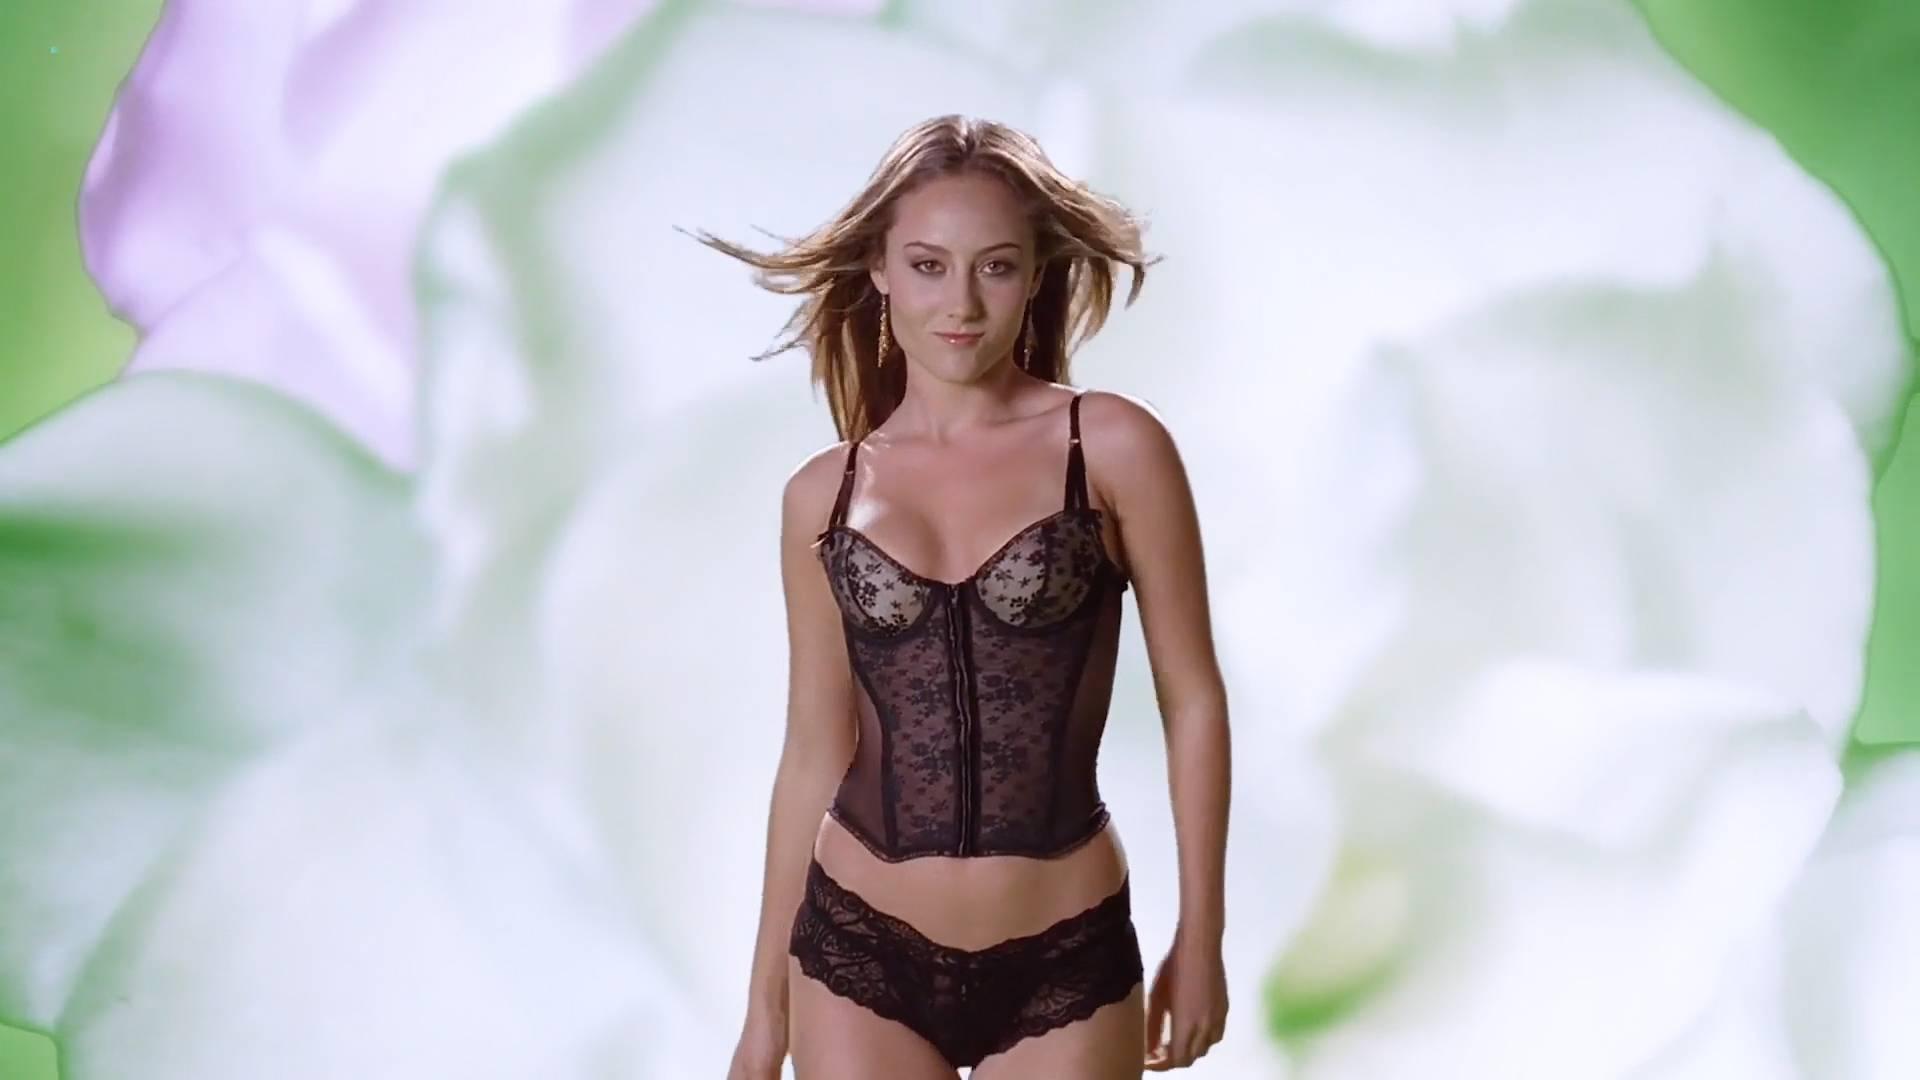 Arielle Kebbel hot, Tara Killian nude other's nude too - American Pie Presents Band Camp (2005) HD 1080p BluRay (15)